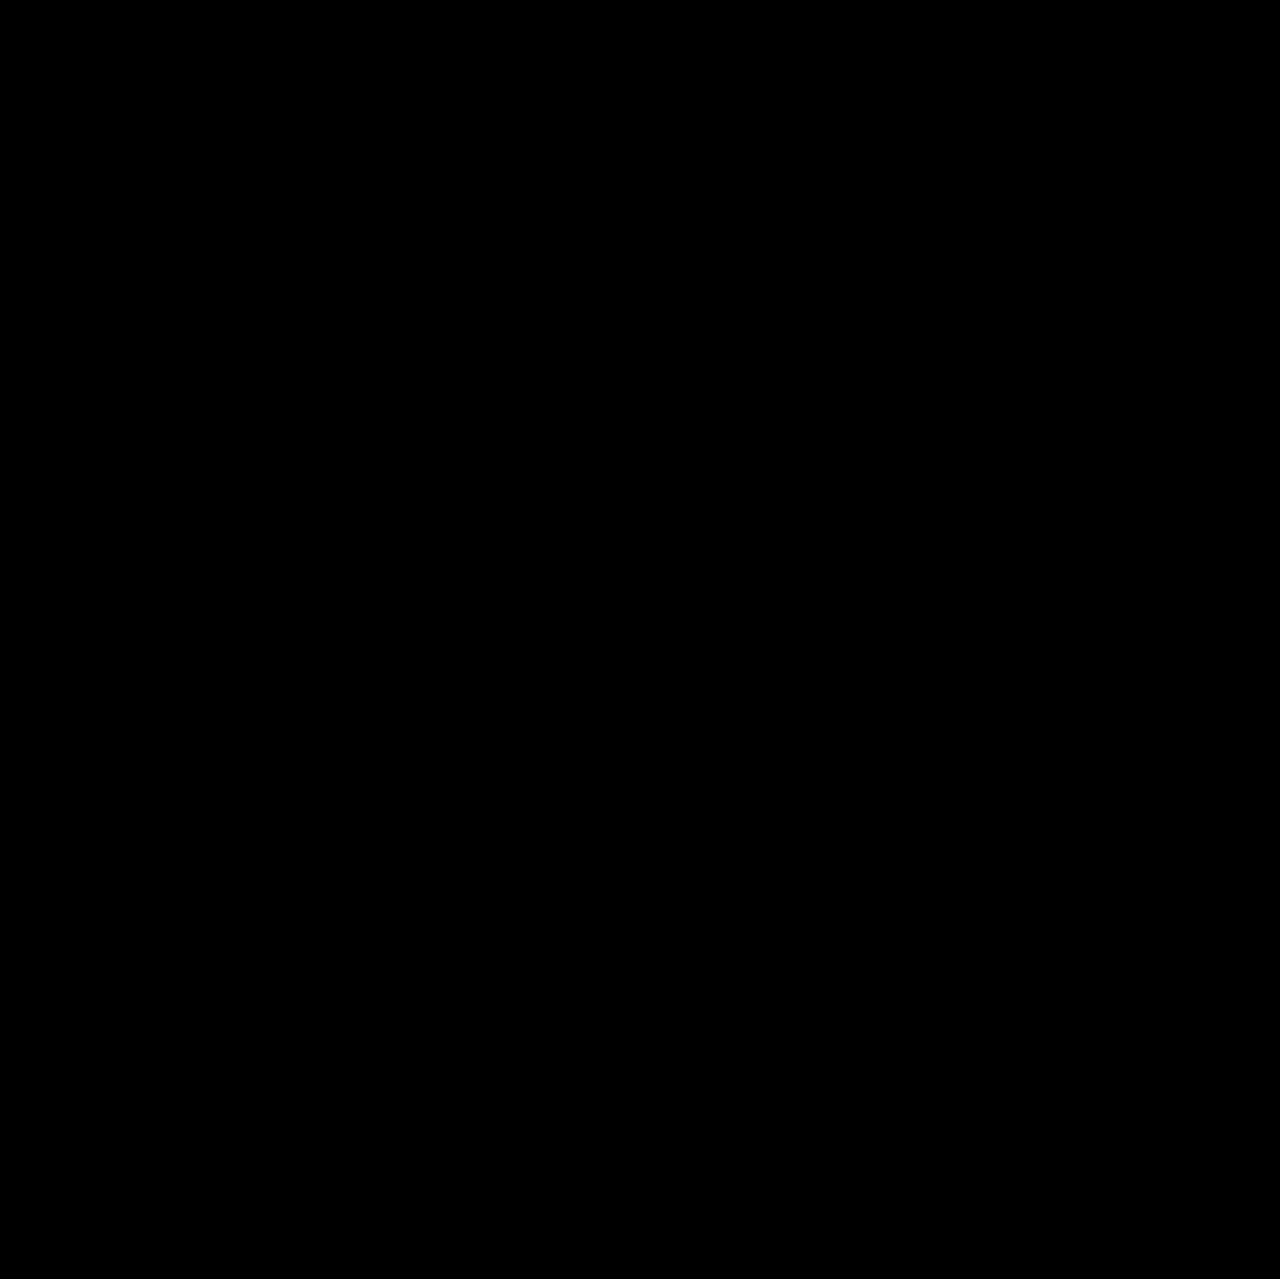 Google Stadia Logo with Font PNG Image